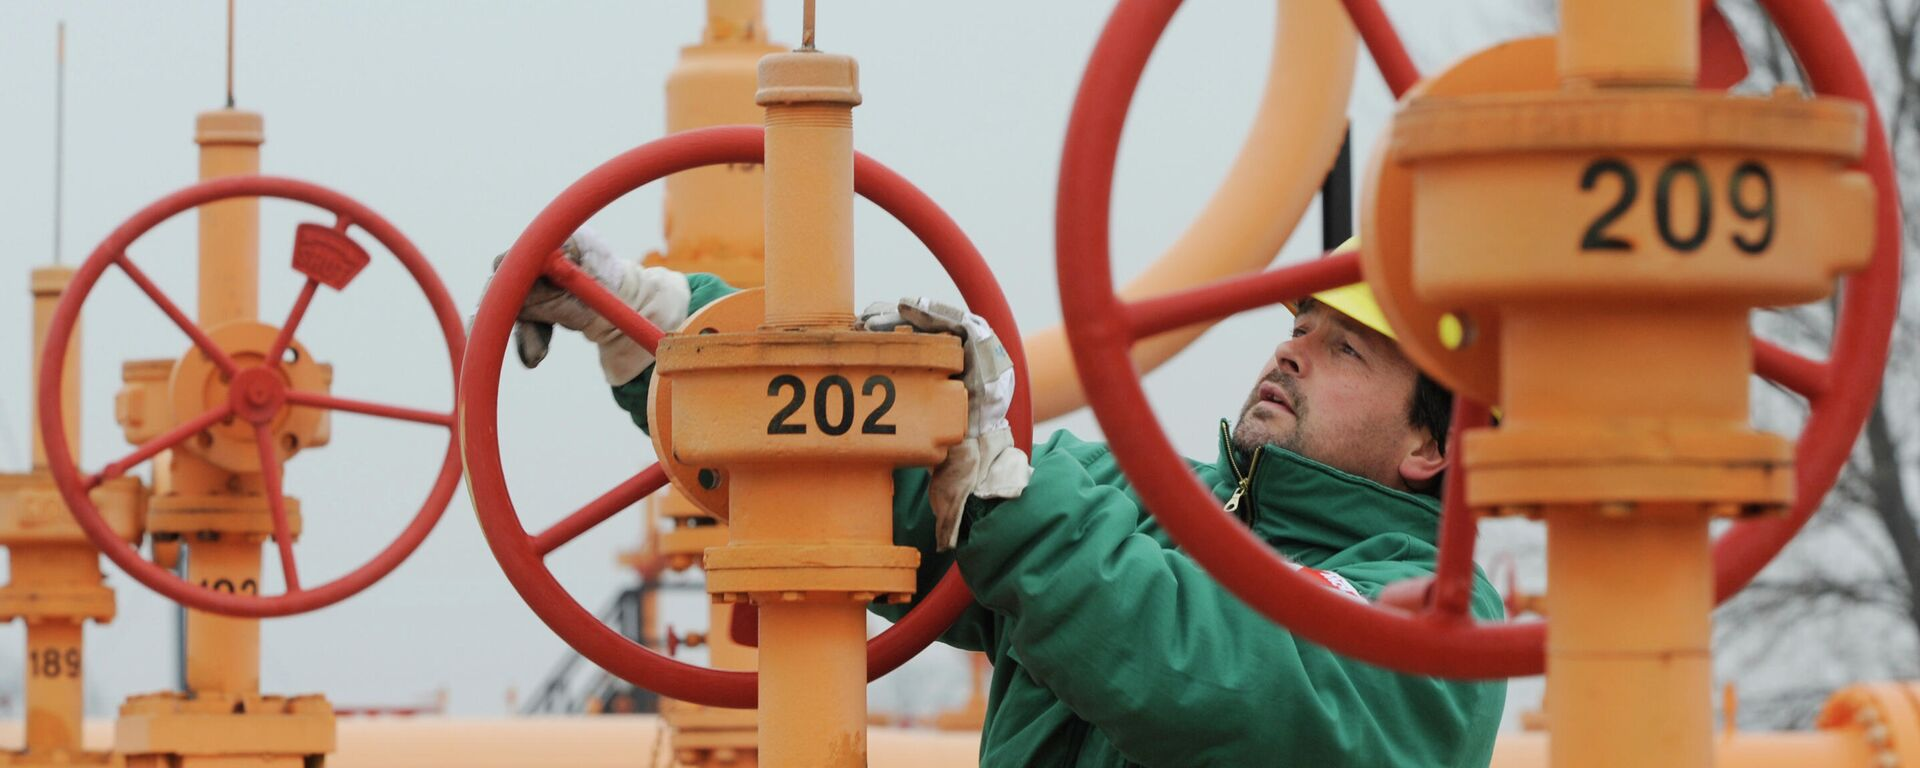 Рабочий на газовом хранилище в Будапеште - Sputnik Узбекистан, 1920, 24.09.2021